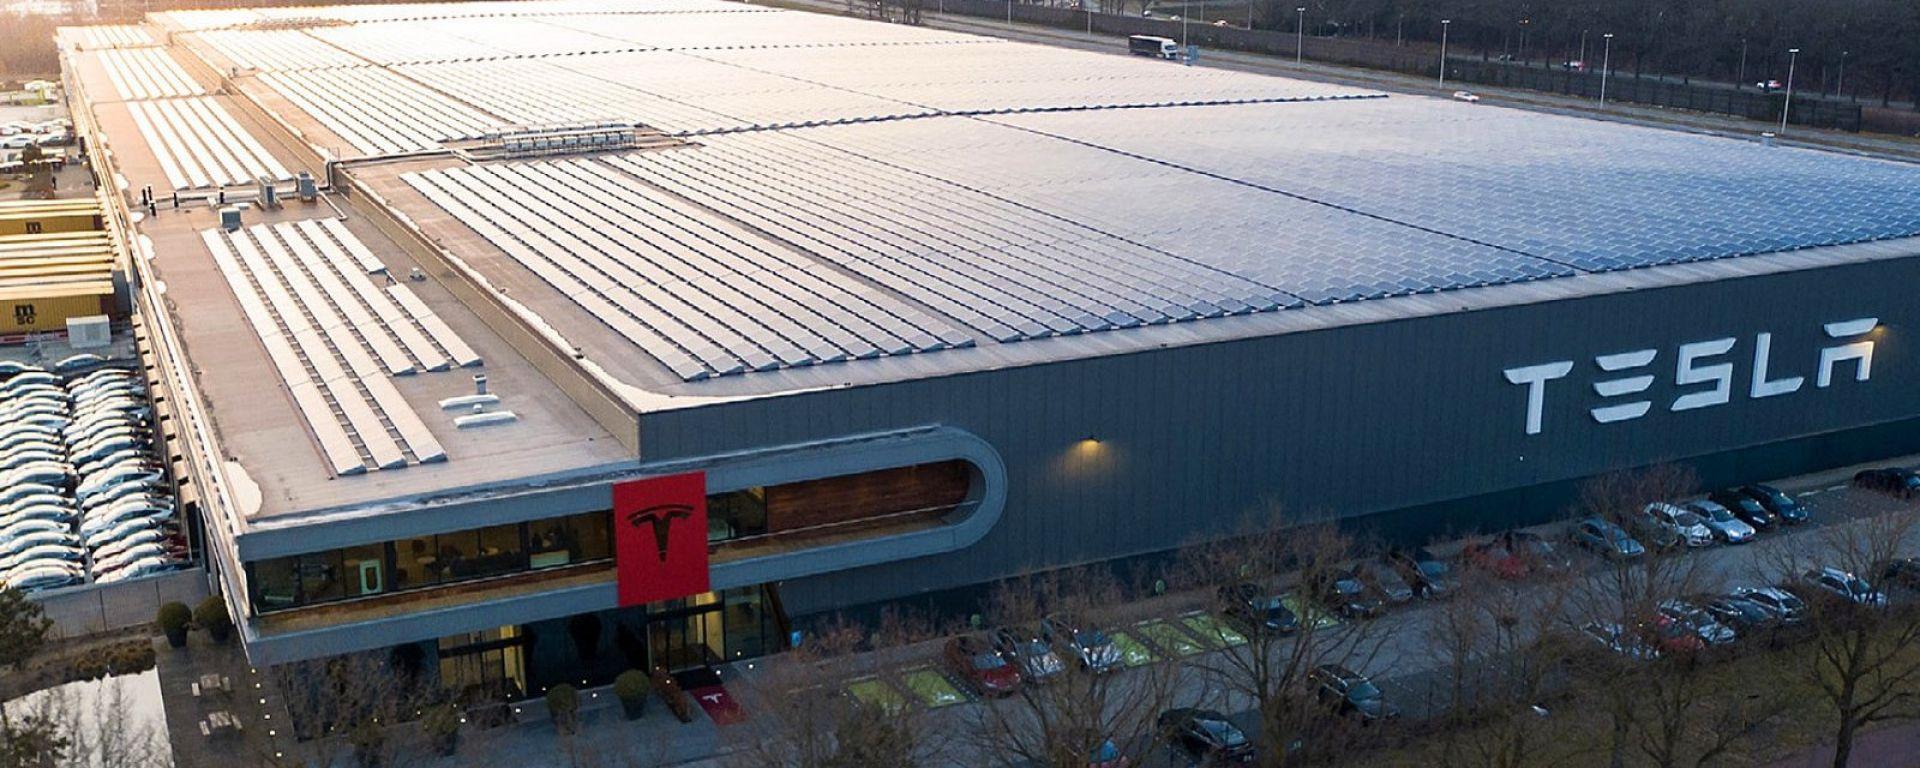 Tesla Gigafactory a Berlino: arrivano i finanziamenti dal governo tedesco